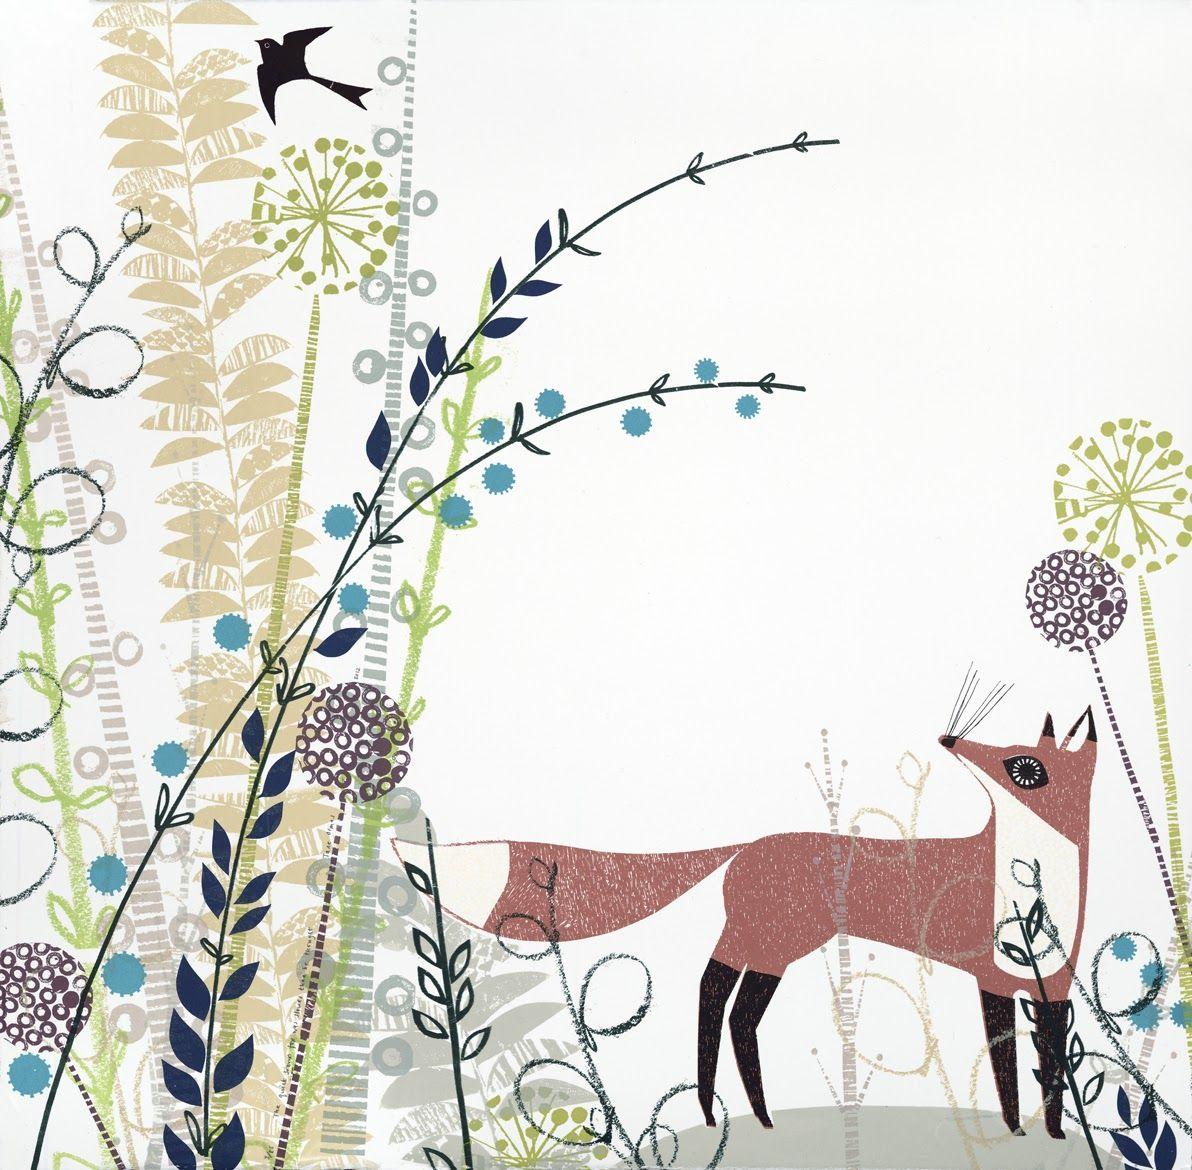 http://janeormes-printmaker.blogspot.co.uk/